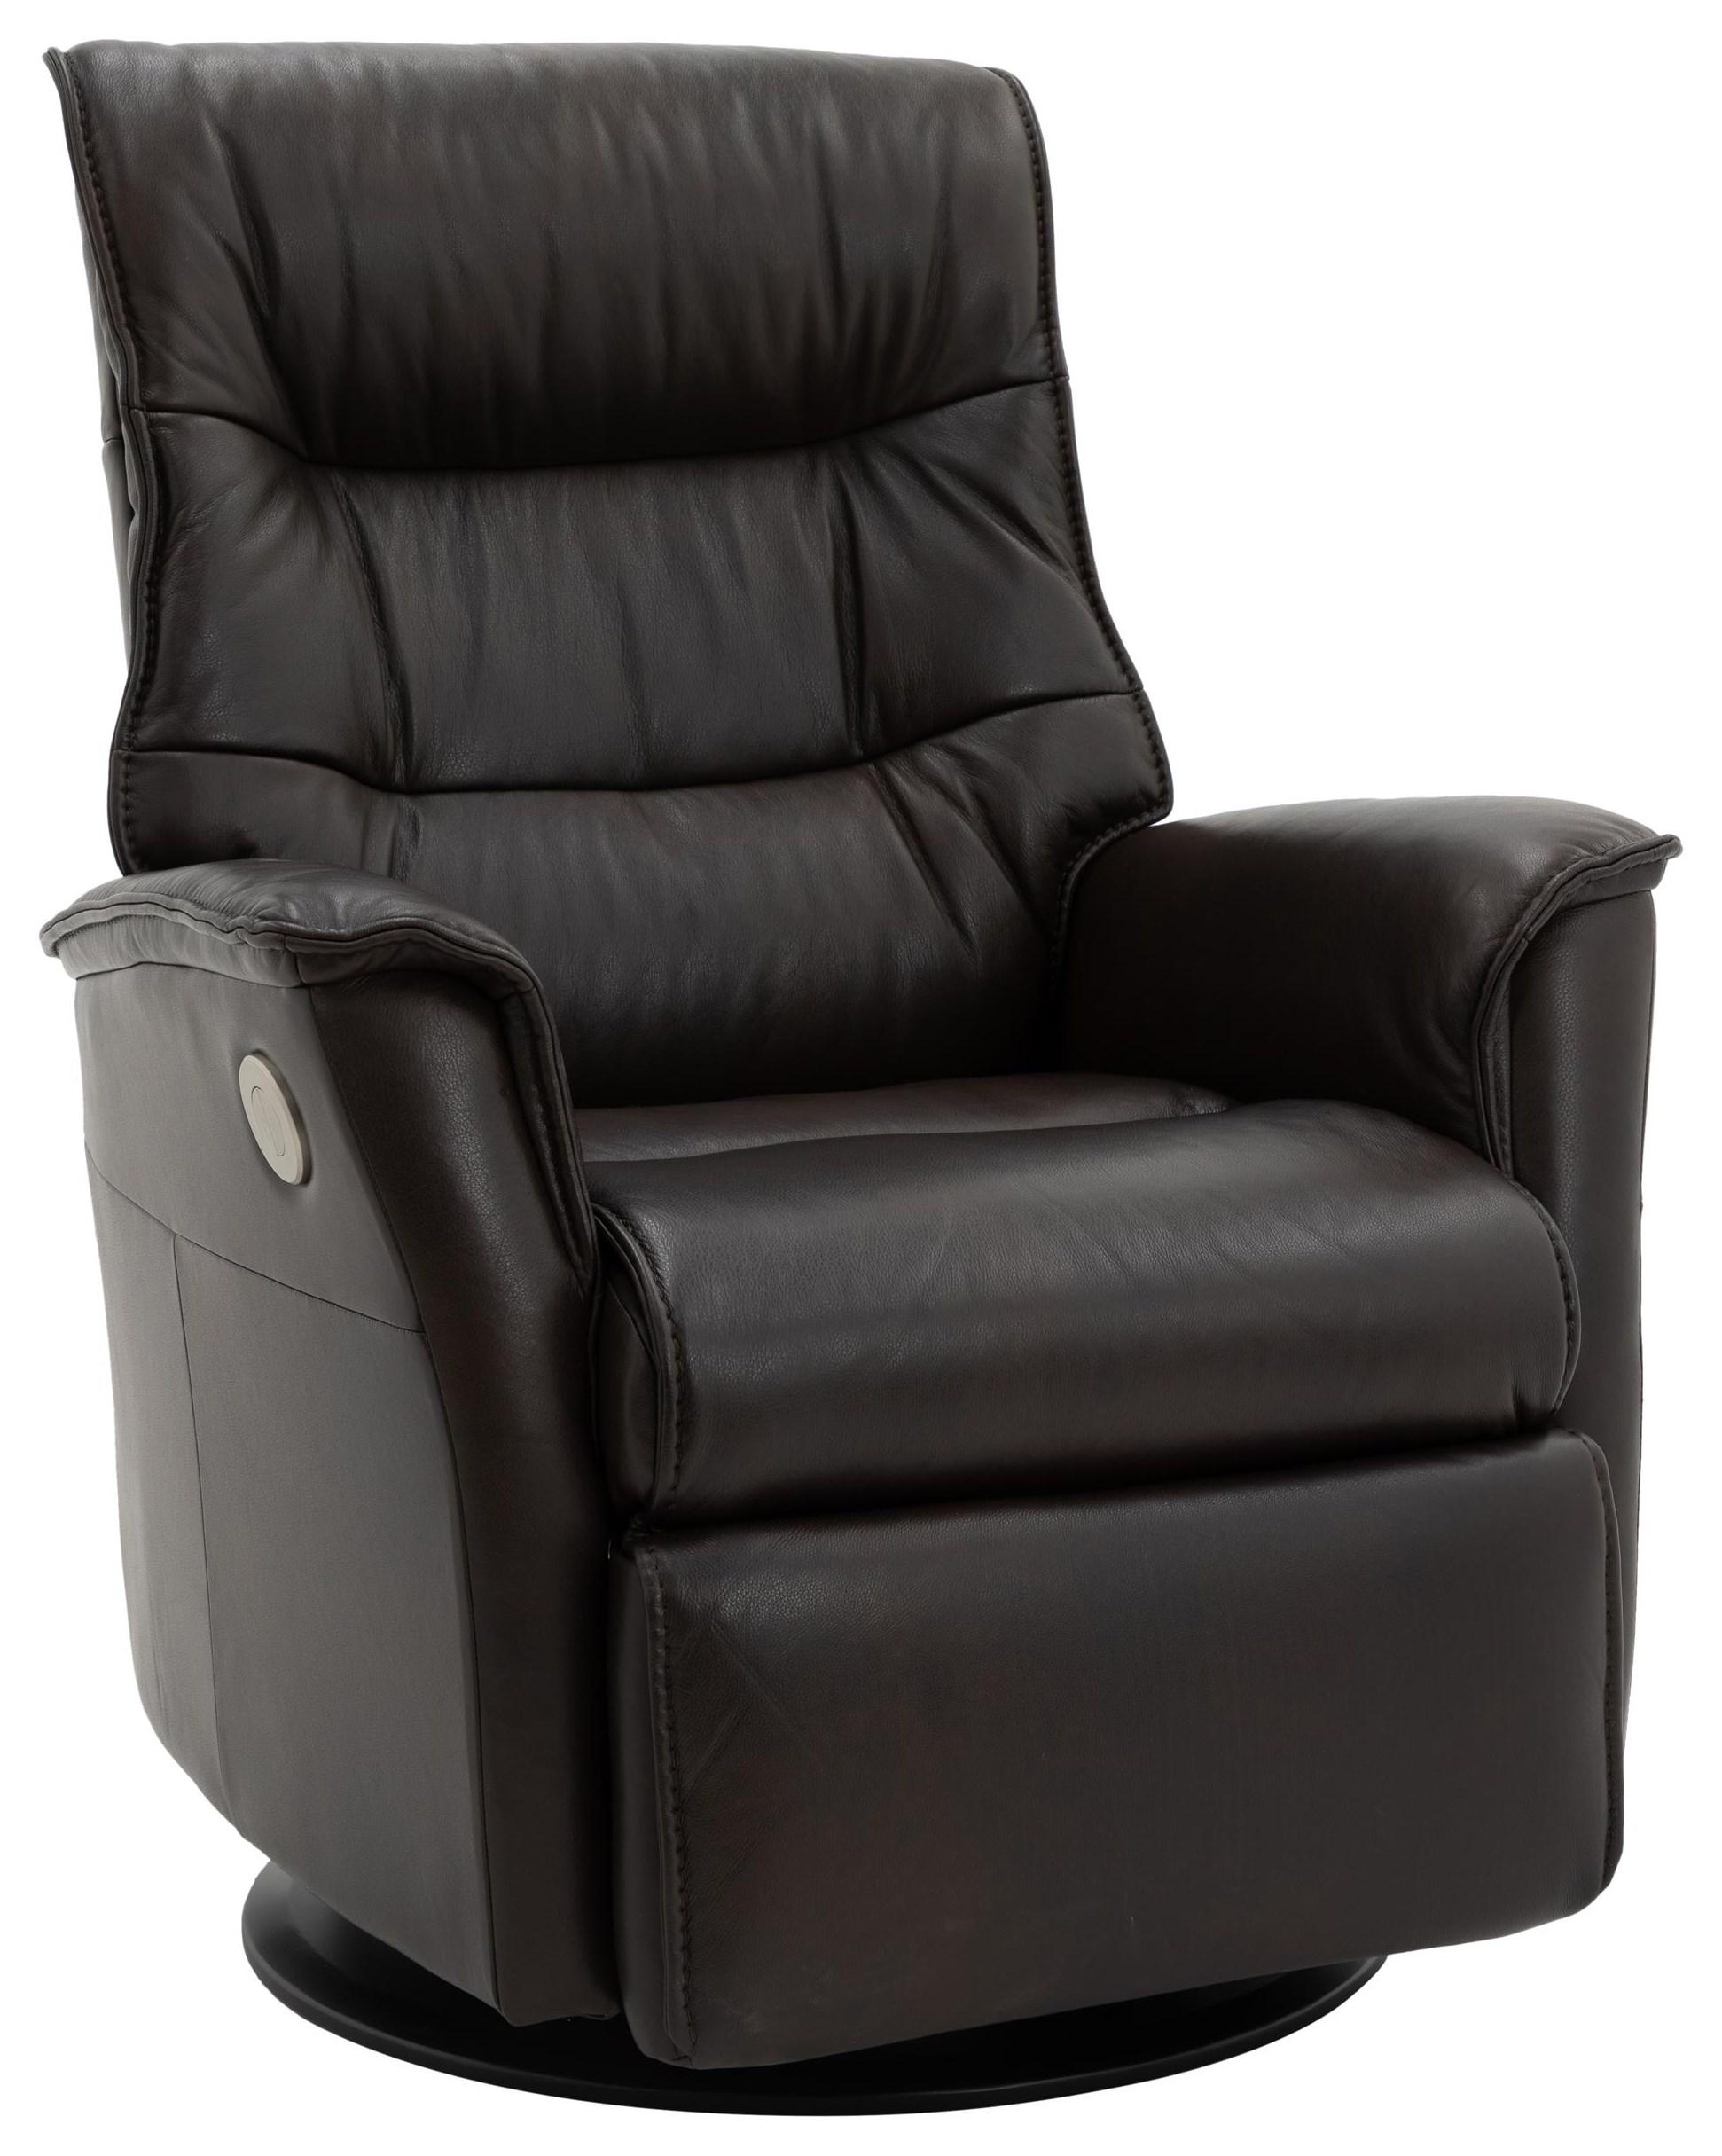 PARAMOUNT Dark Brown Leather Medium Power Recliner by Norwegian Comfort at Walker's Furniture